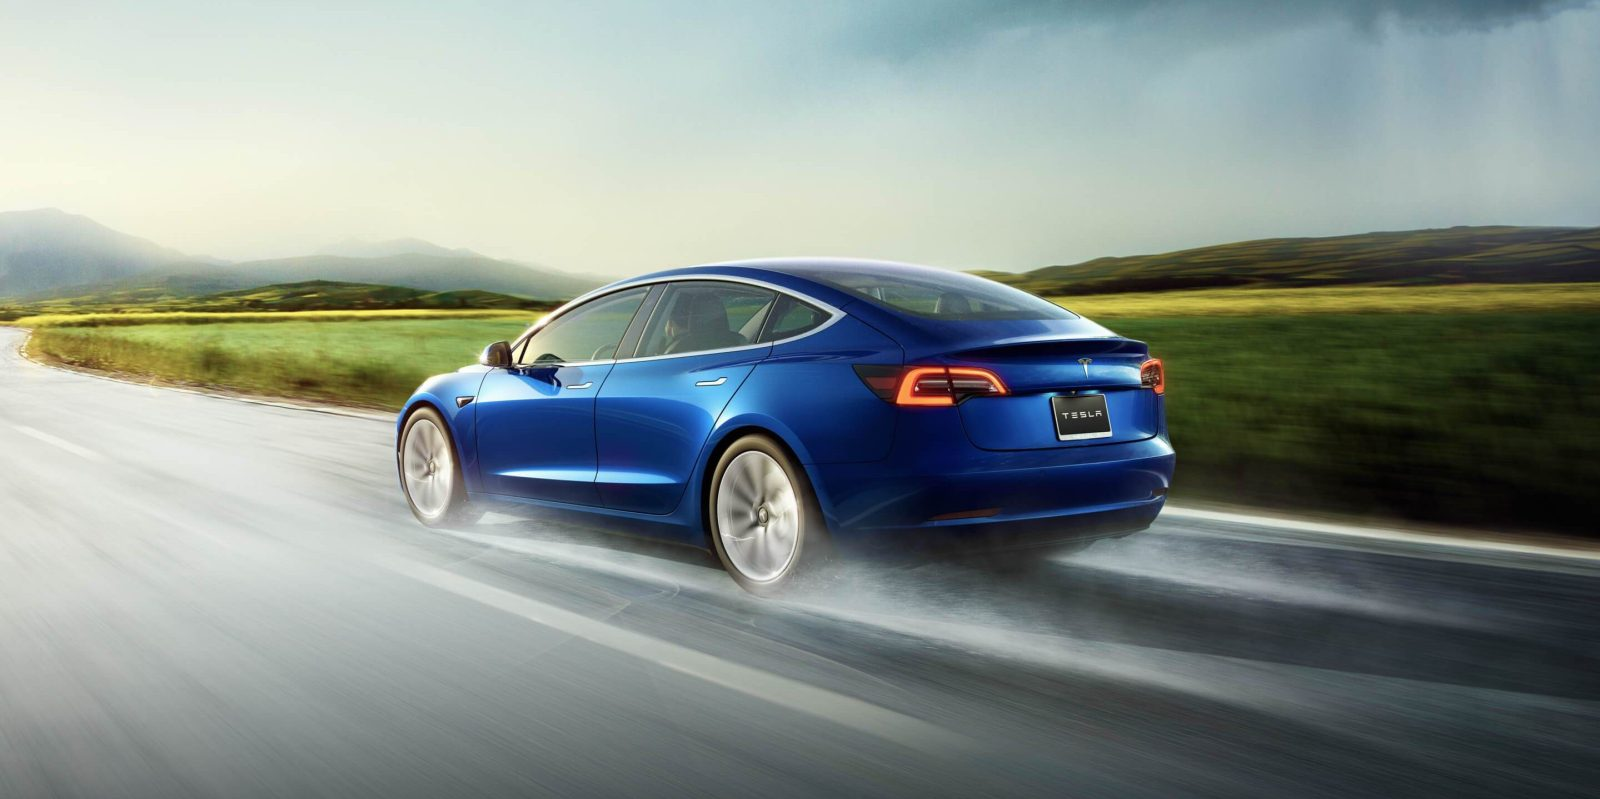 Tesla-Model-3-hero-e1540462426728.jpg